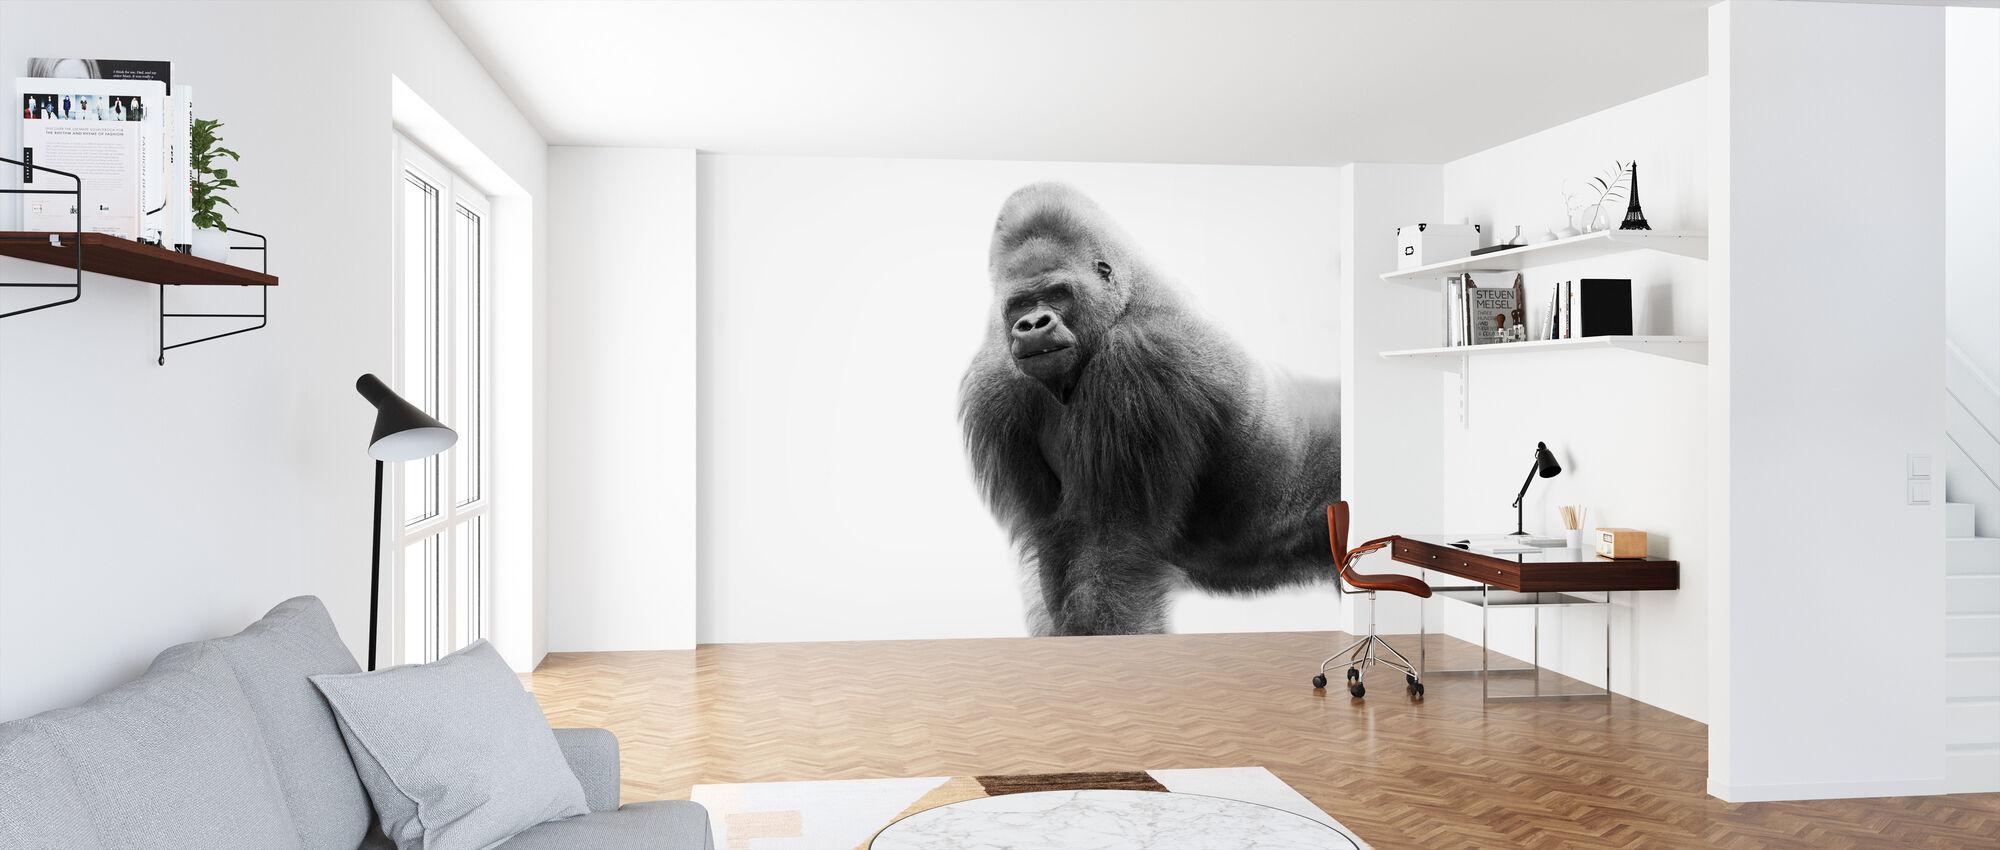 One Gorilla - Wallpaper - Office